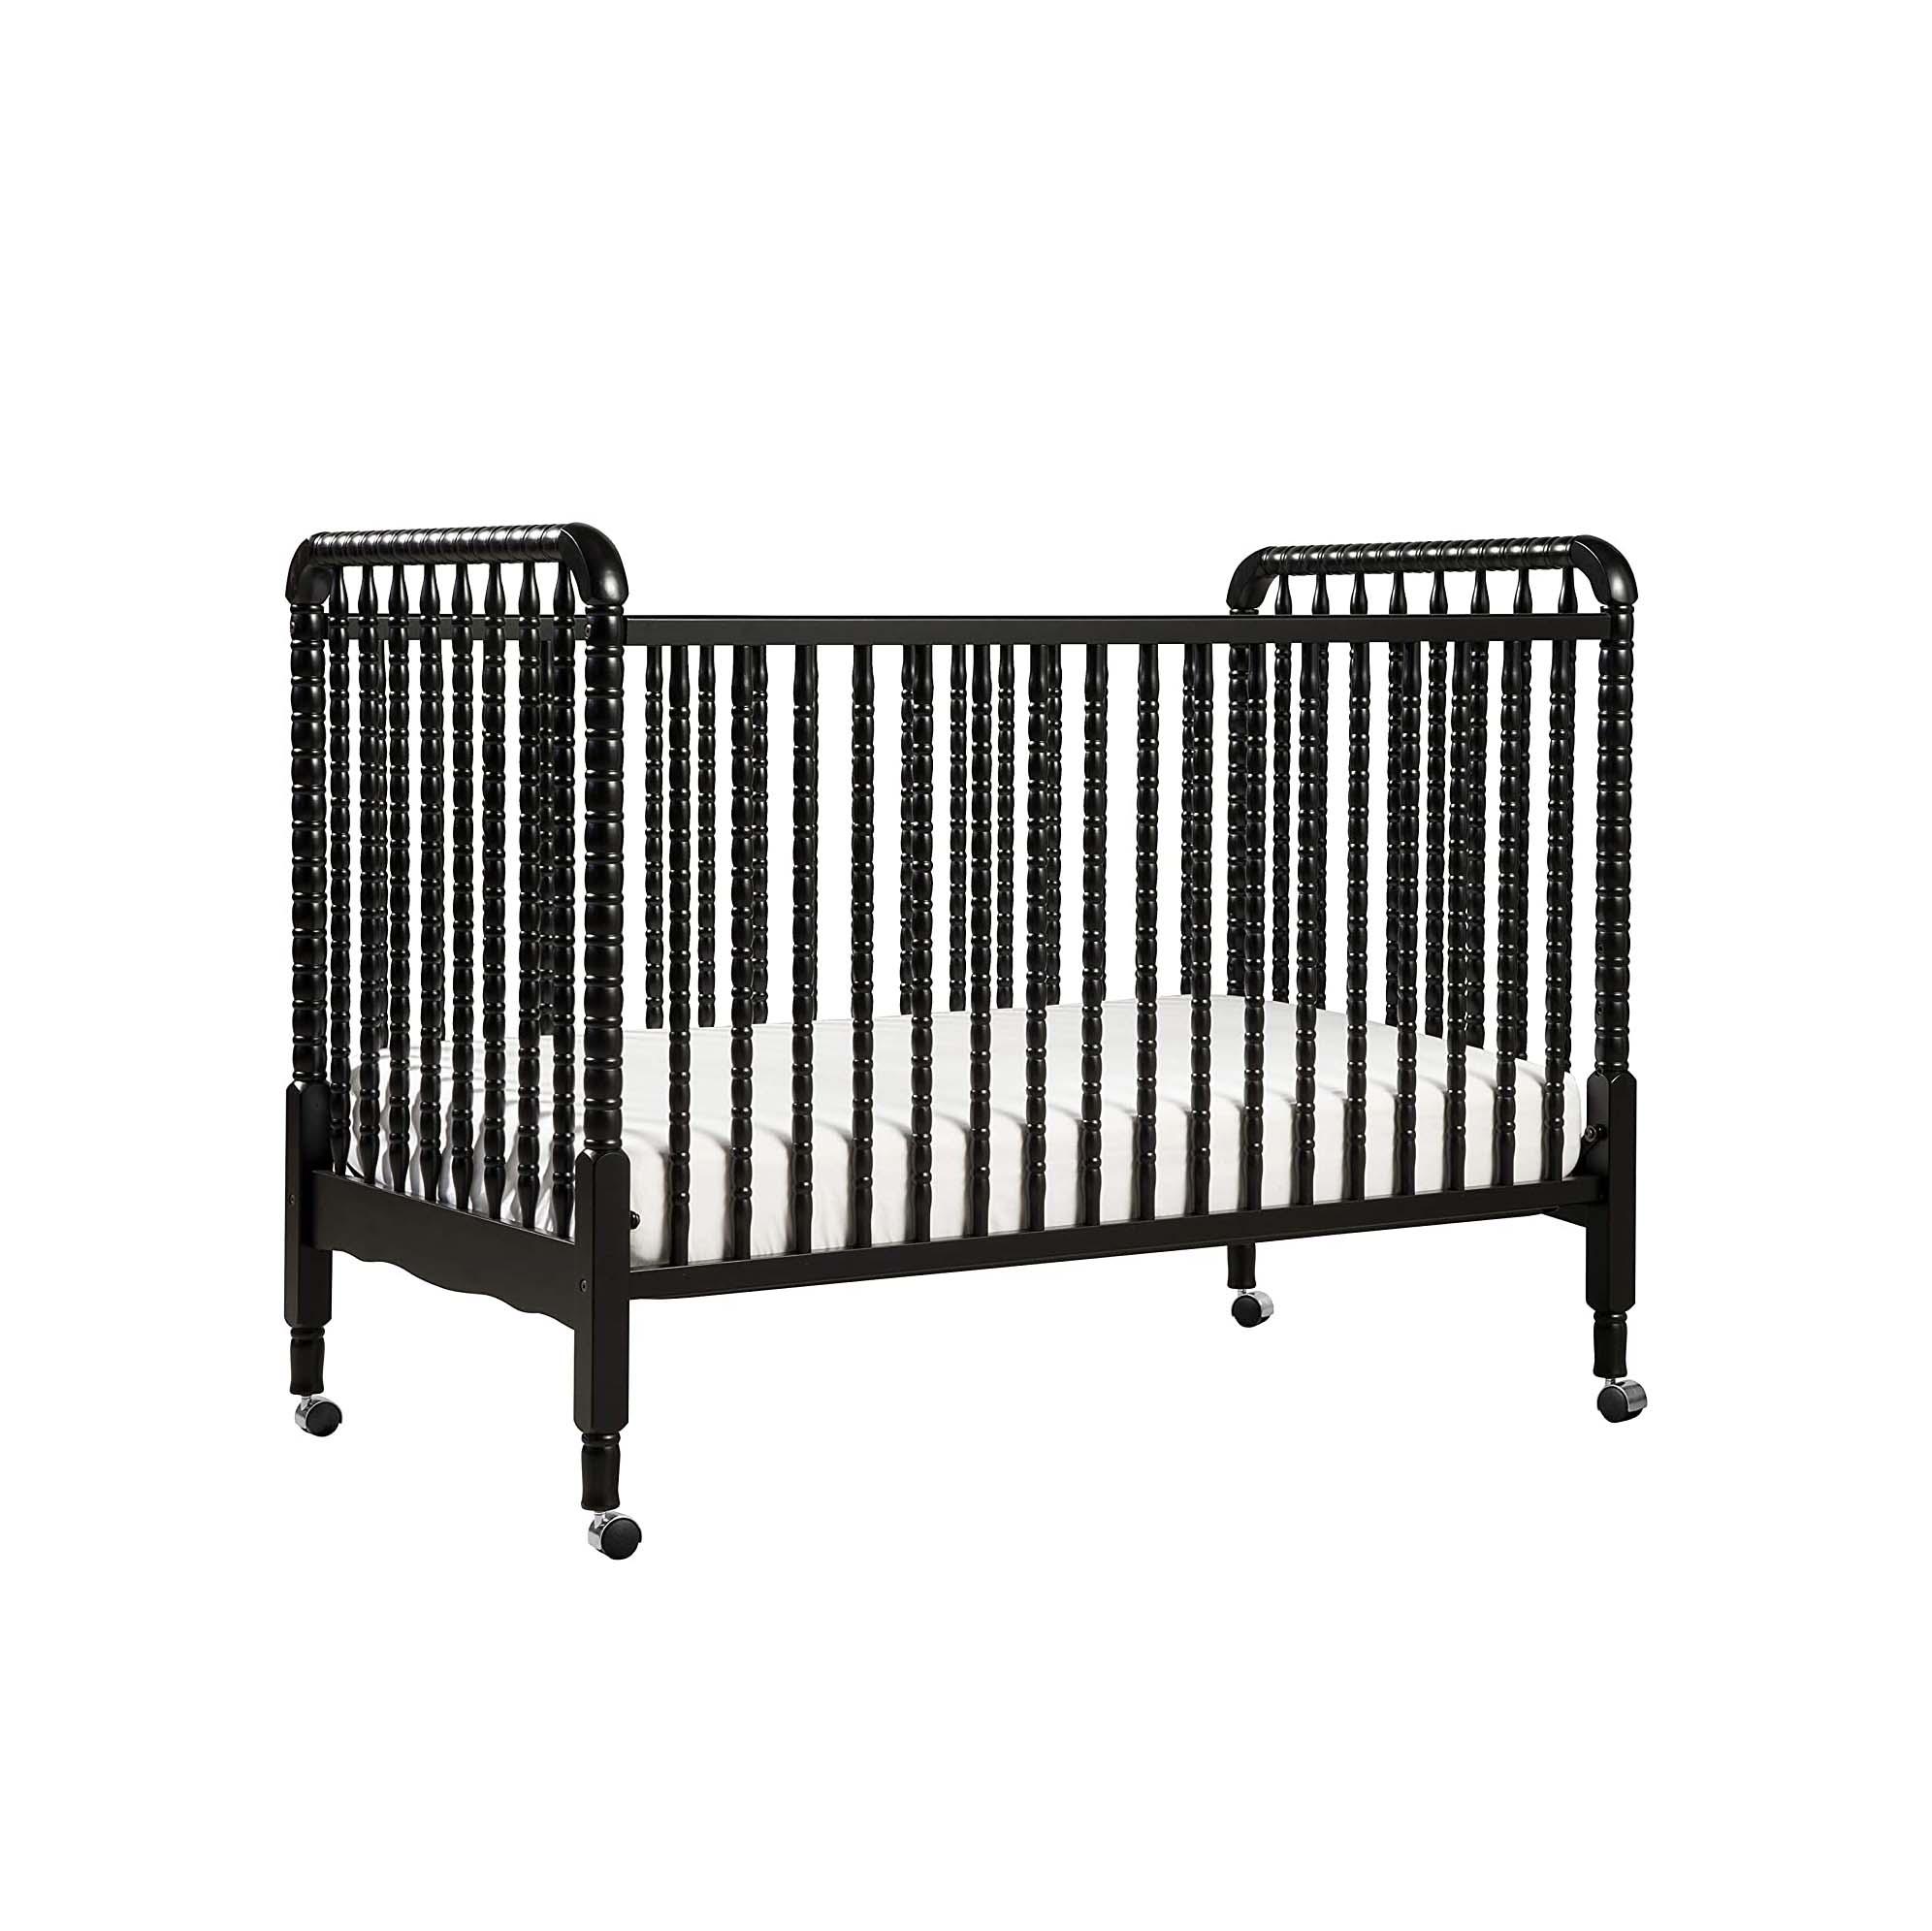 The-Best-Baby-Crib-Option-DaVinci-Jenny-Lind-Crib